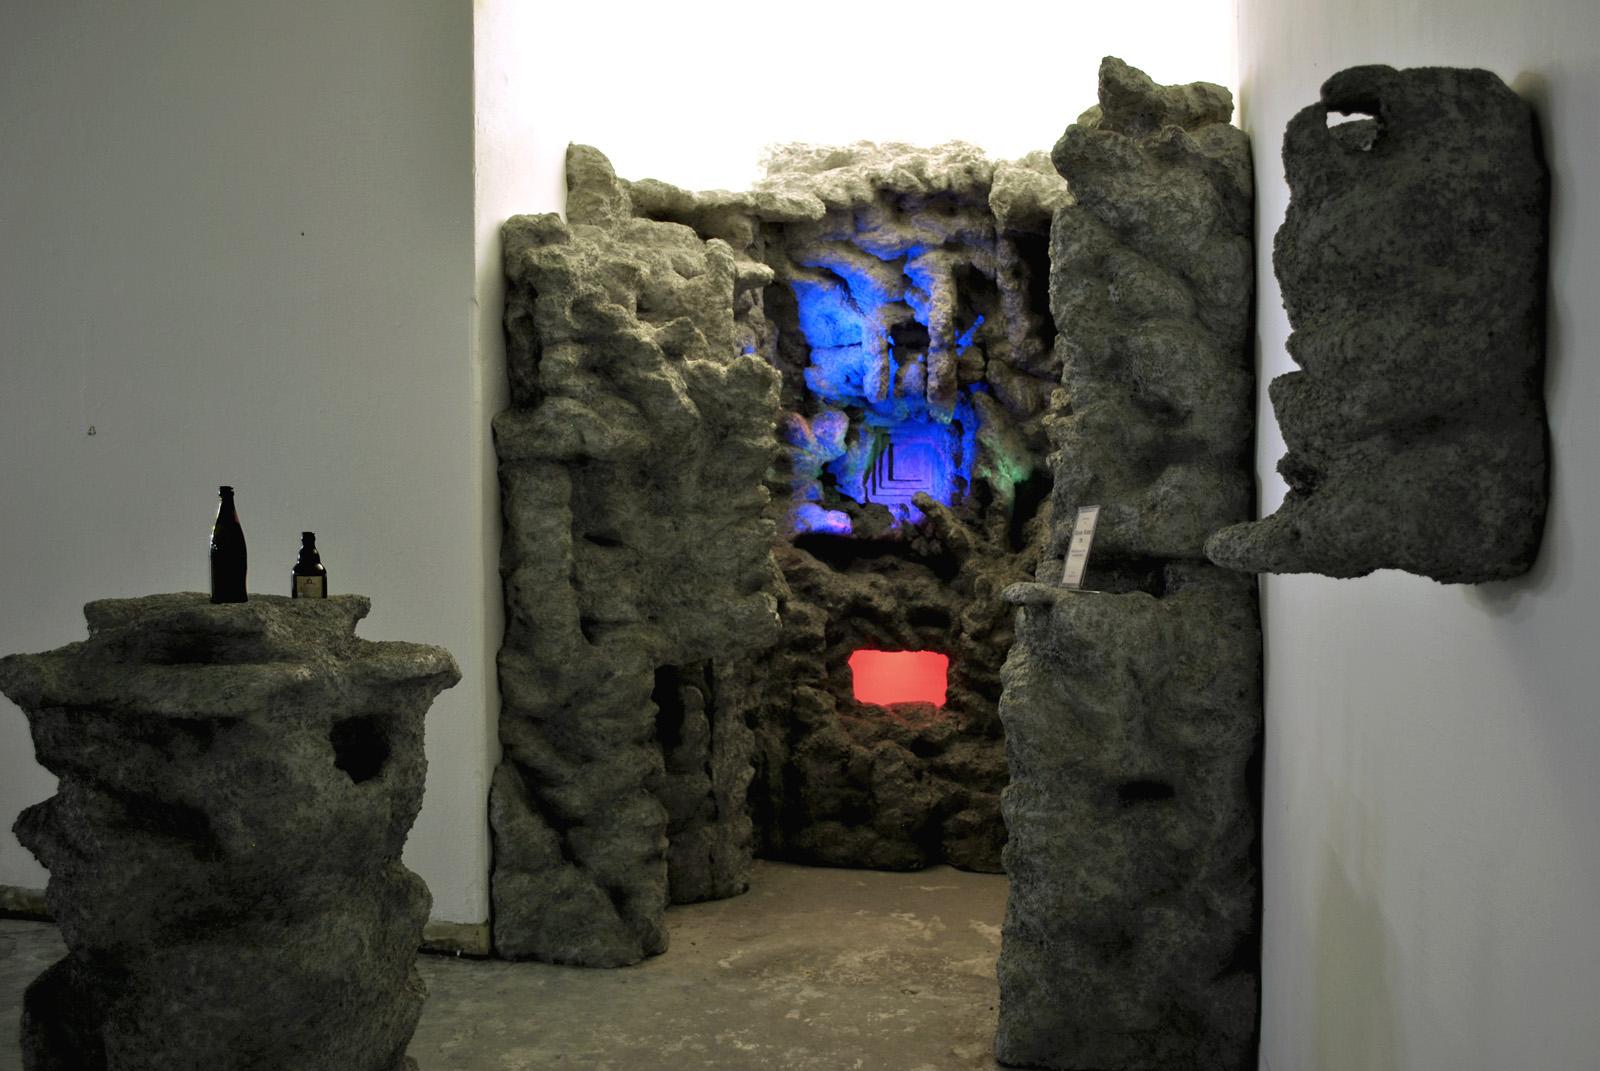 Michel Aniol Kunst Berlin Art Installation Frank Wagner Cave Canem